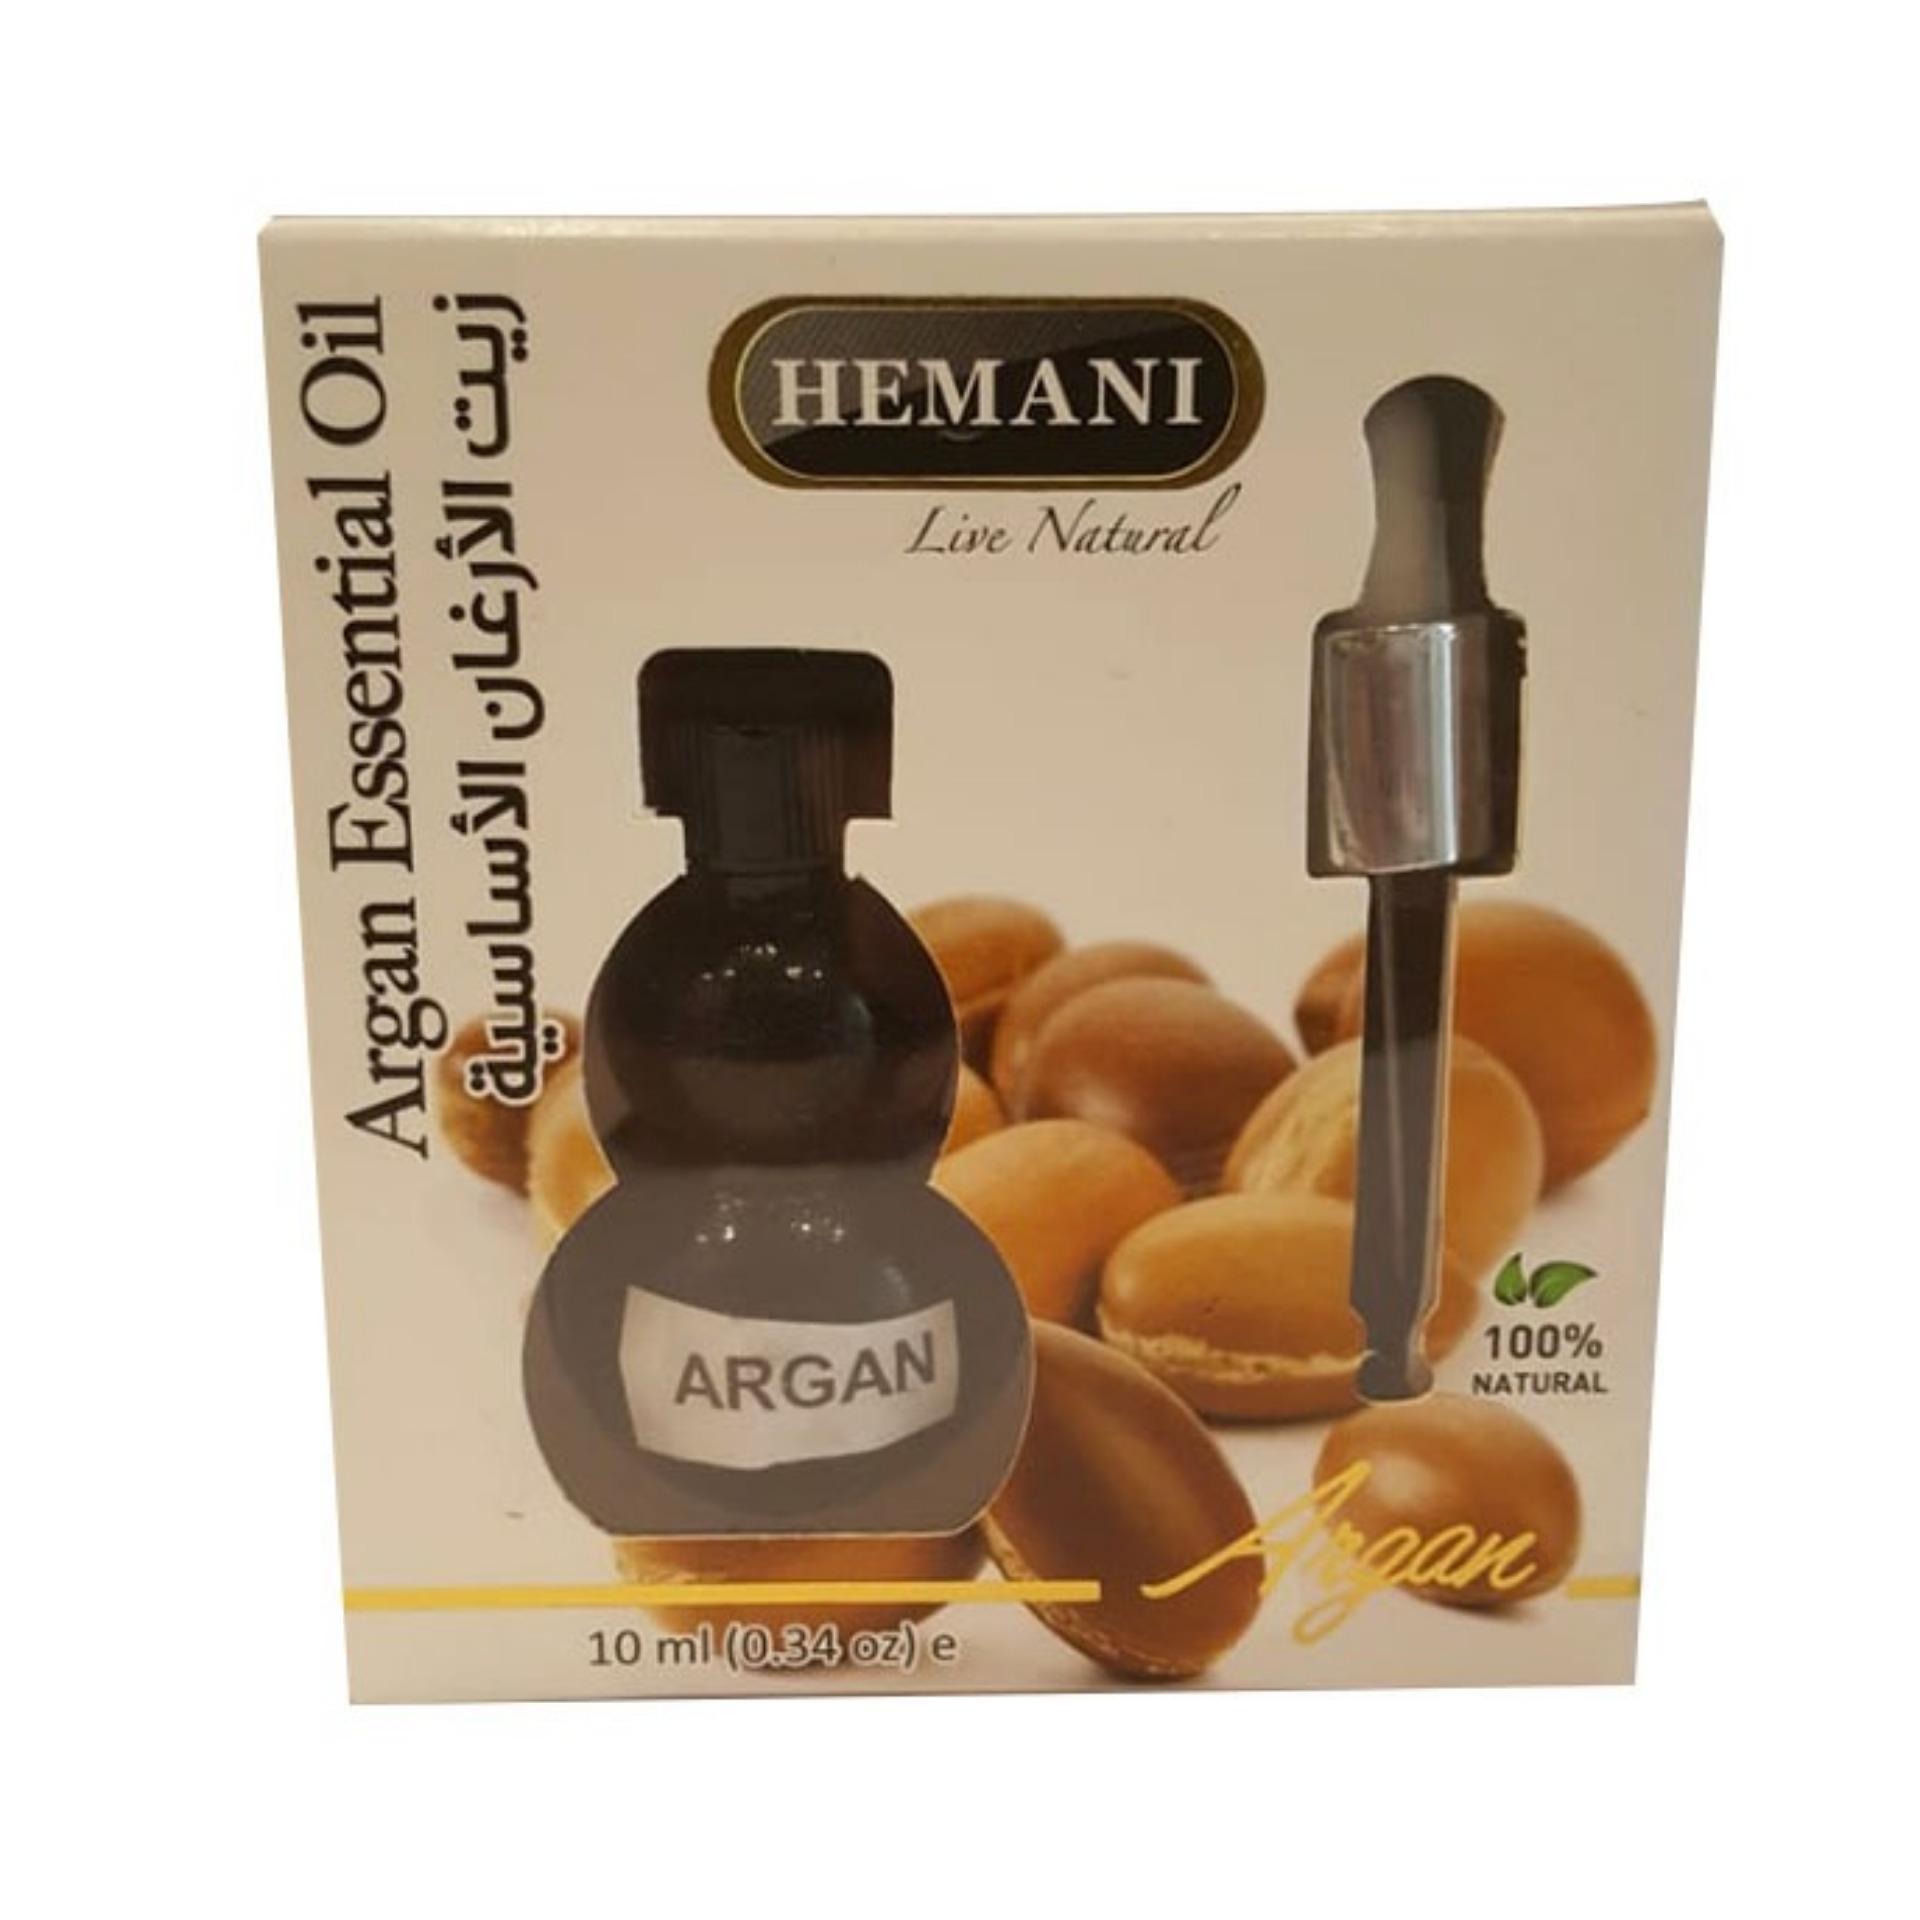 Hemani Argan Essential Oil 10ml